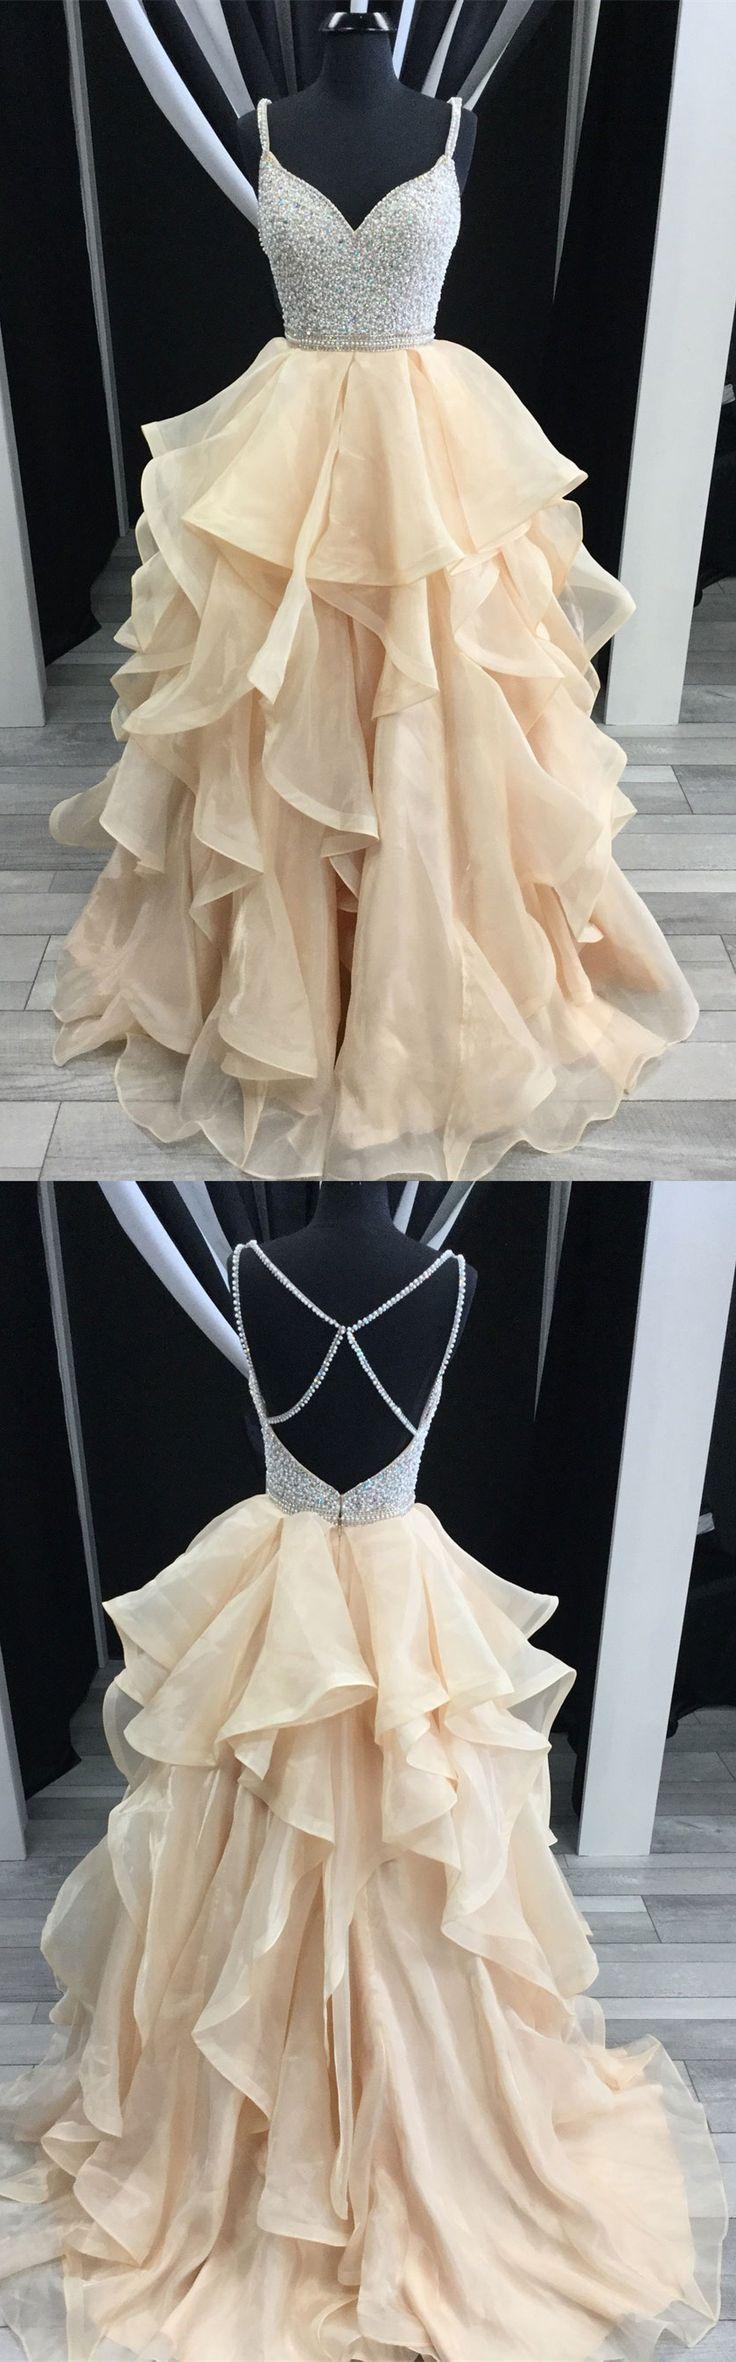 Organza skrit Prom Dresses,Shine Prom Dresses,Long Prom Dresses,Pageant Dresses,#sheergirl #prom